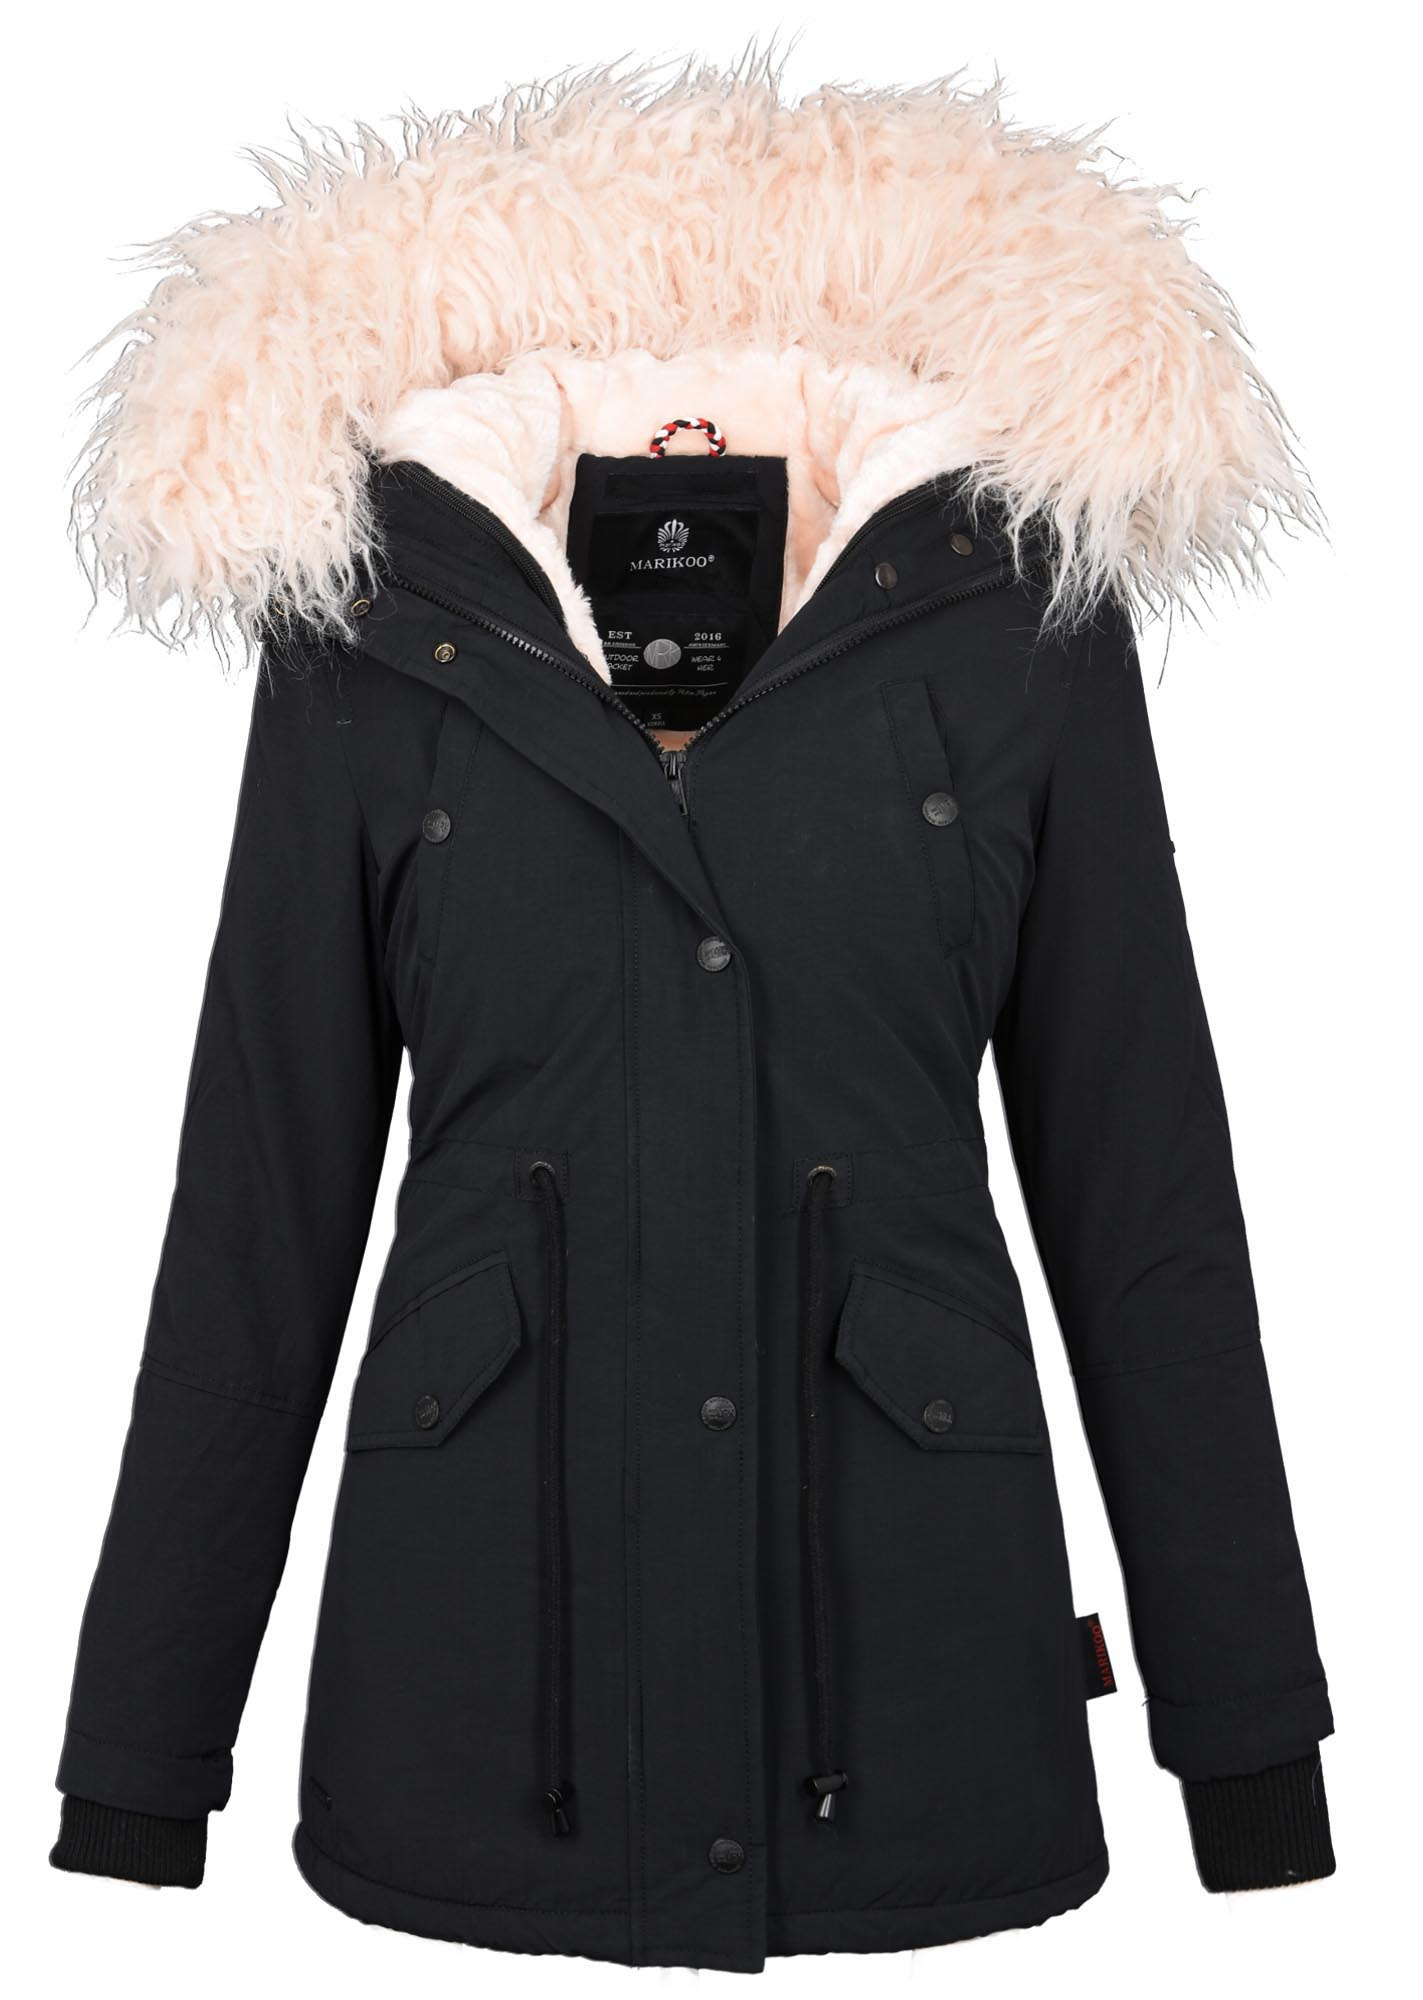 innovative design a05cf 9dc1e Winter B370 Mantel Details Marikoo Zu Winterjacke Jacke Wow ...